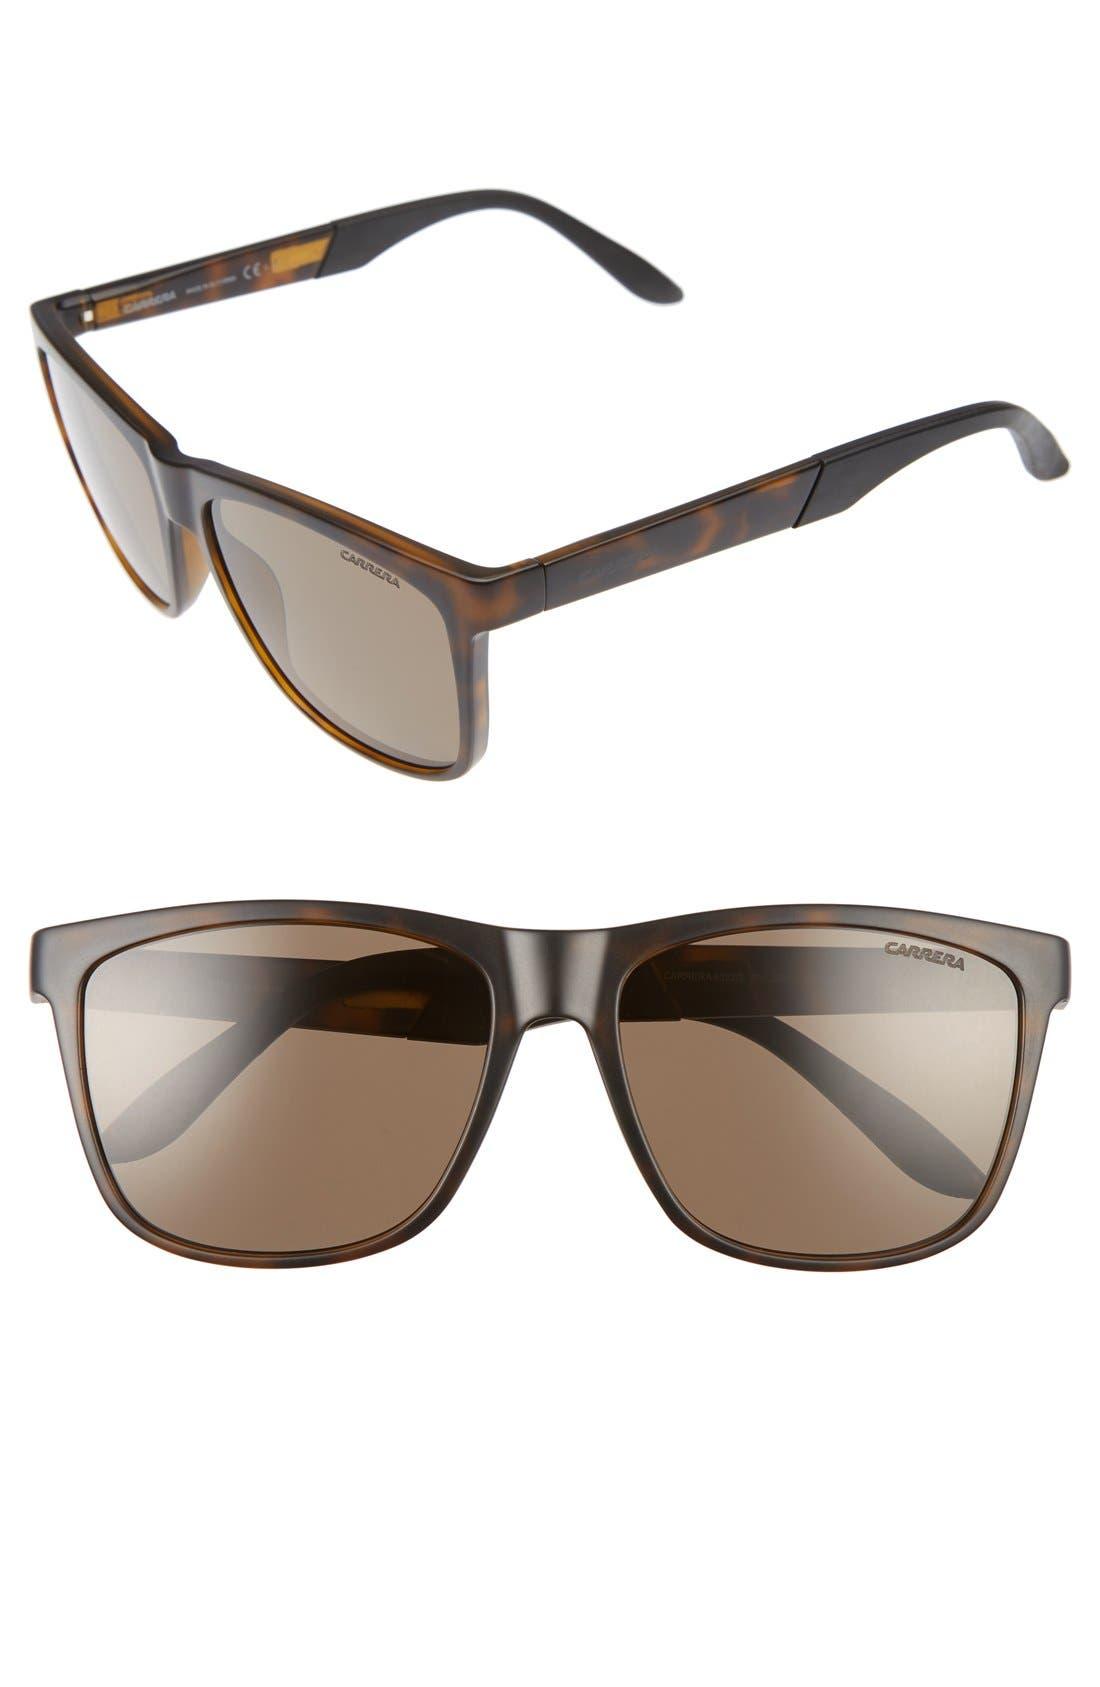 CARRERA EYEWEAR,                             8022/S 56mm Polarized Sunglasses,                             Alternate thumbnail 3, color,                             HAVANA